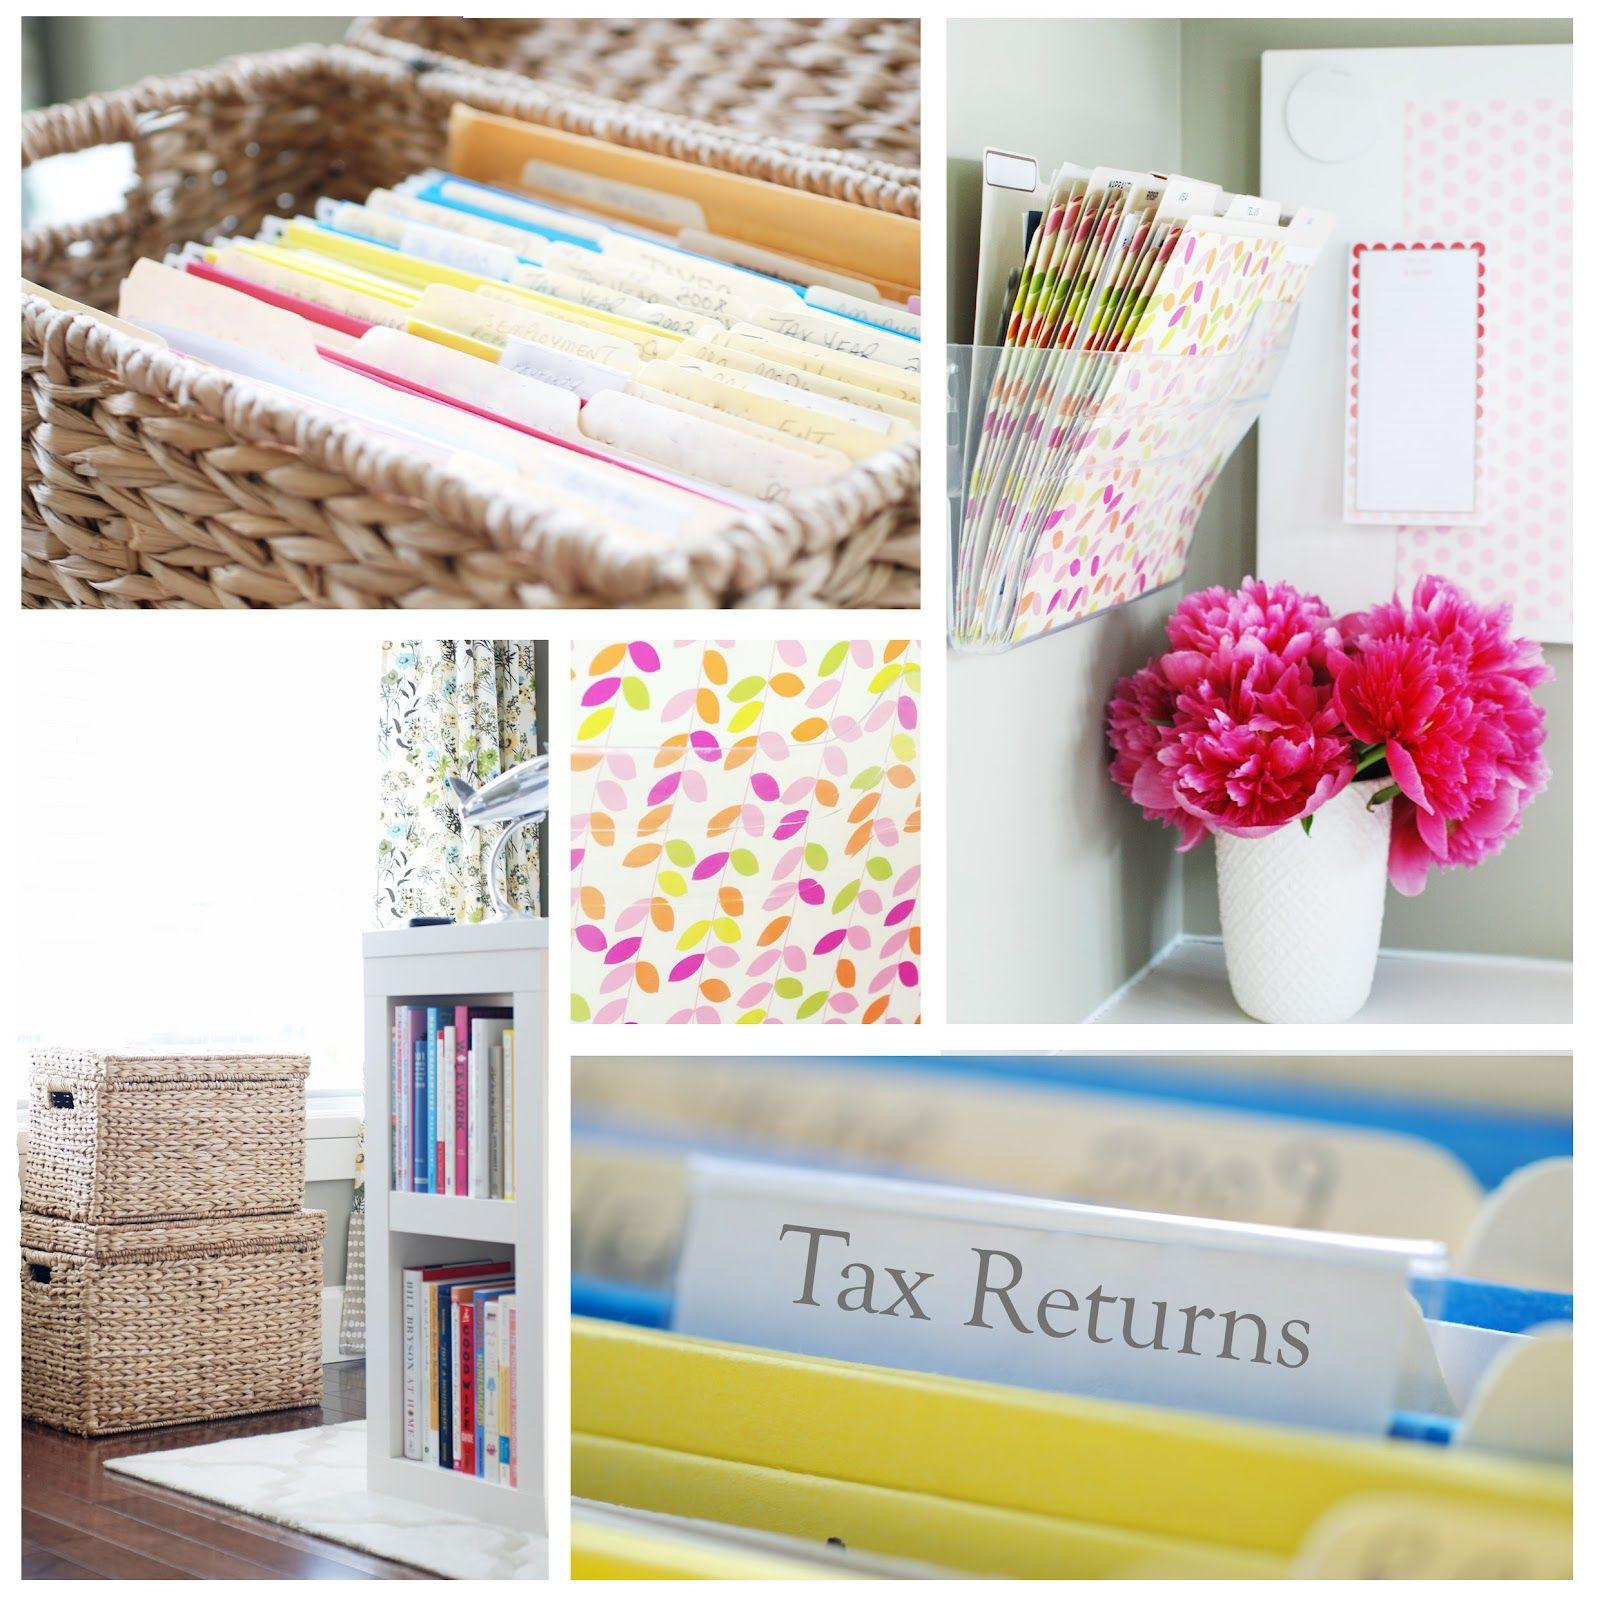 Paperwork Organization | Home Office/Studio Design | Pinterest ...